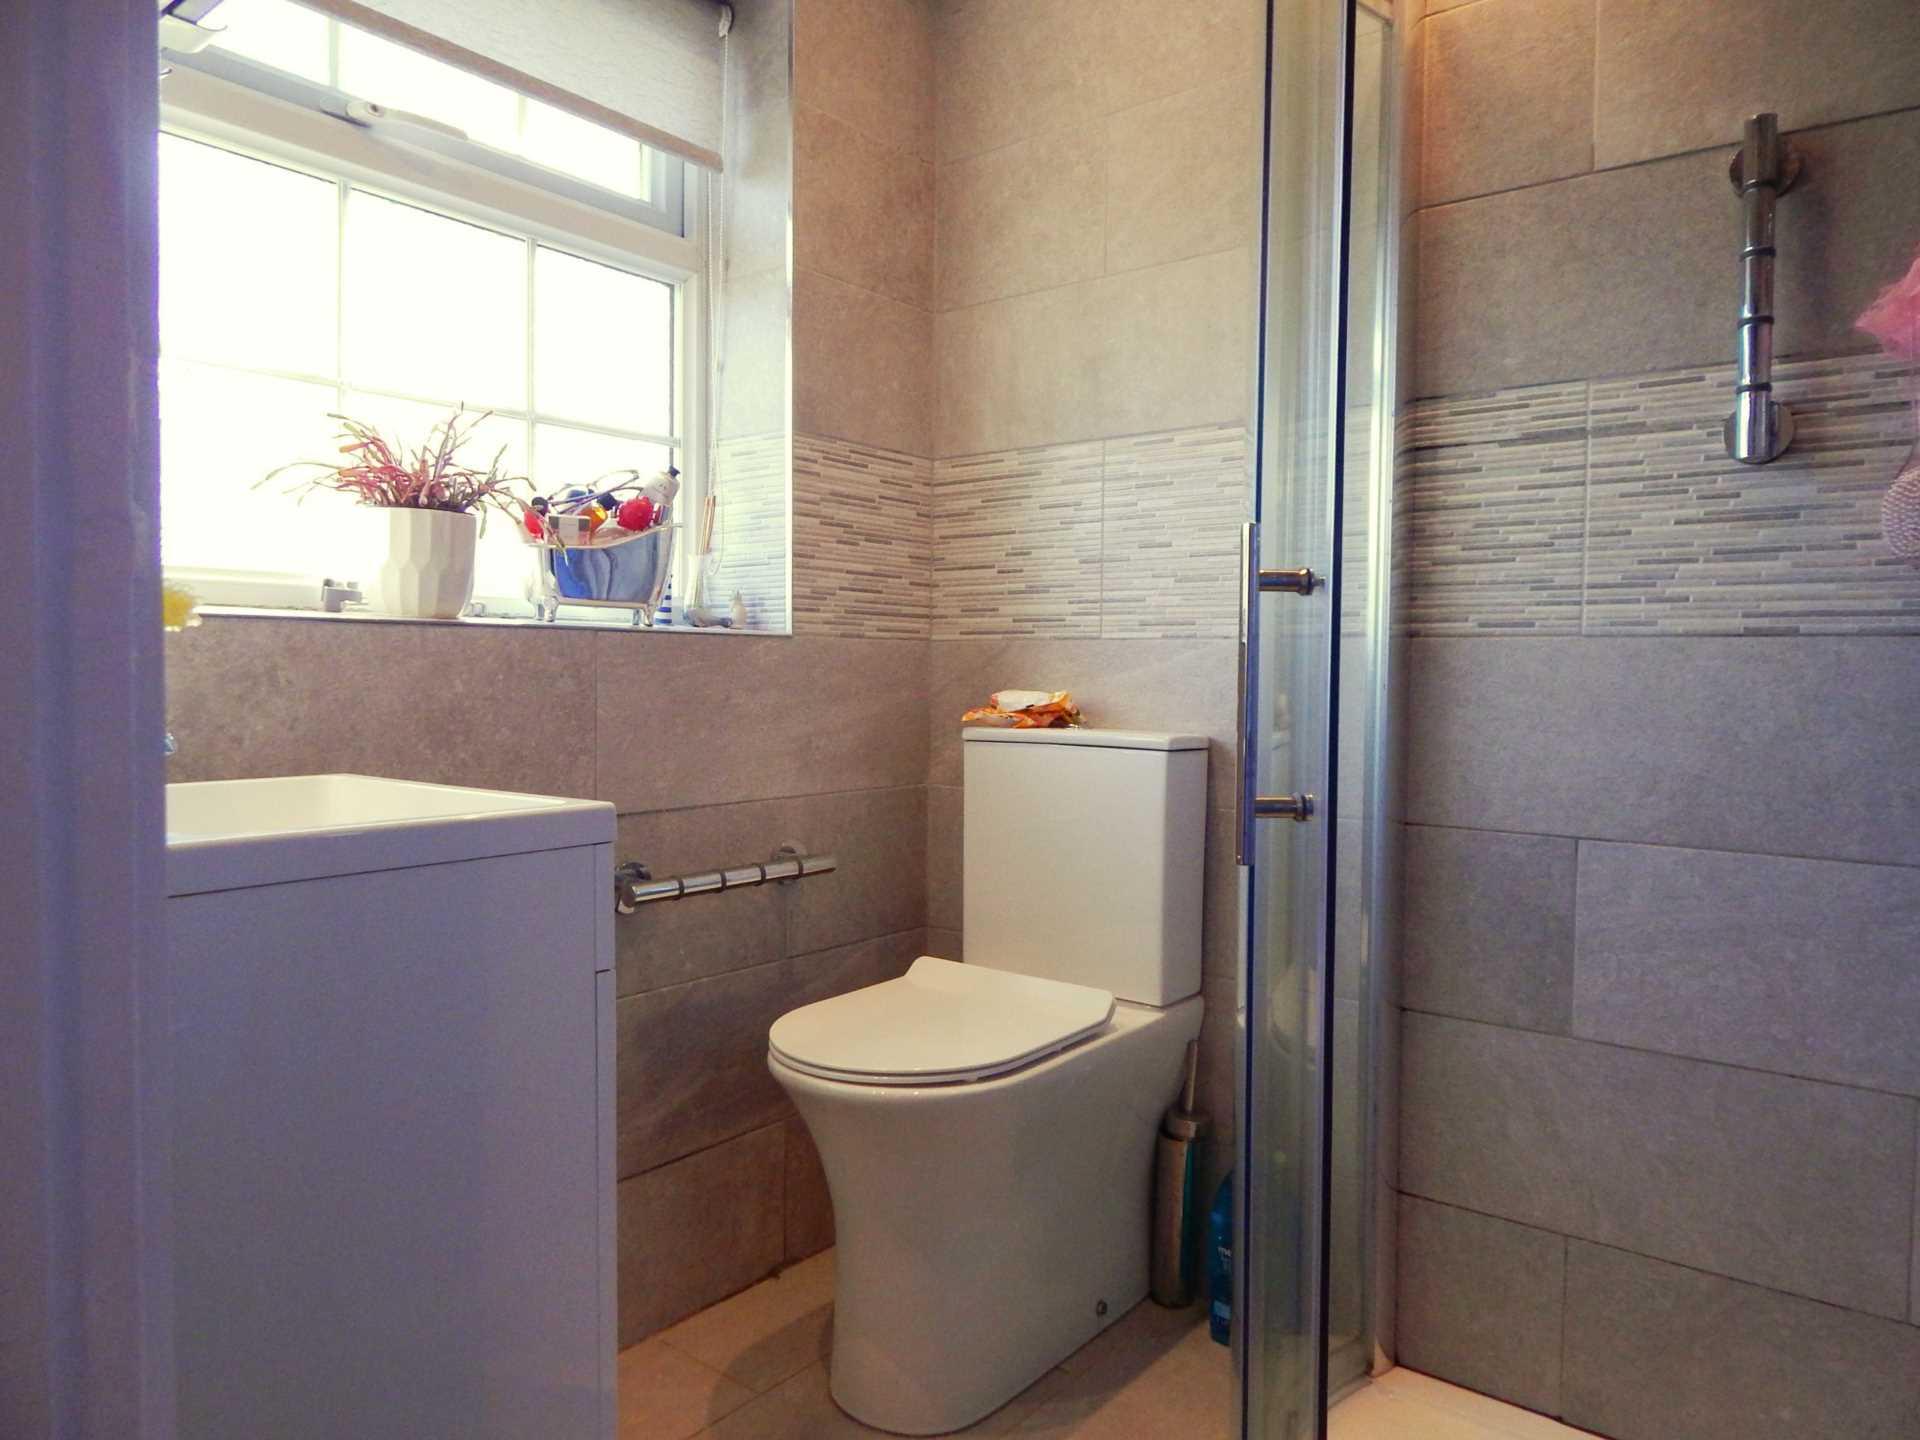 Burnards Field Road, Colyton, Devon, Image 13